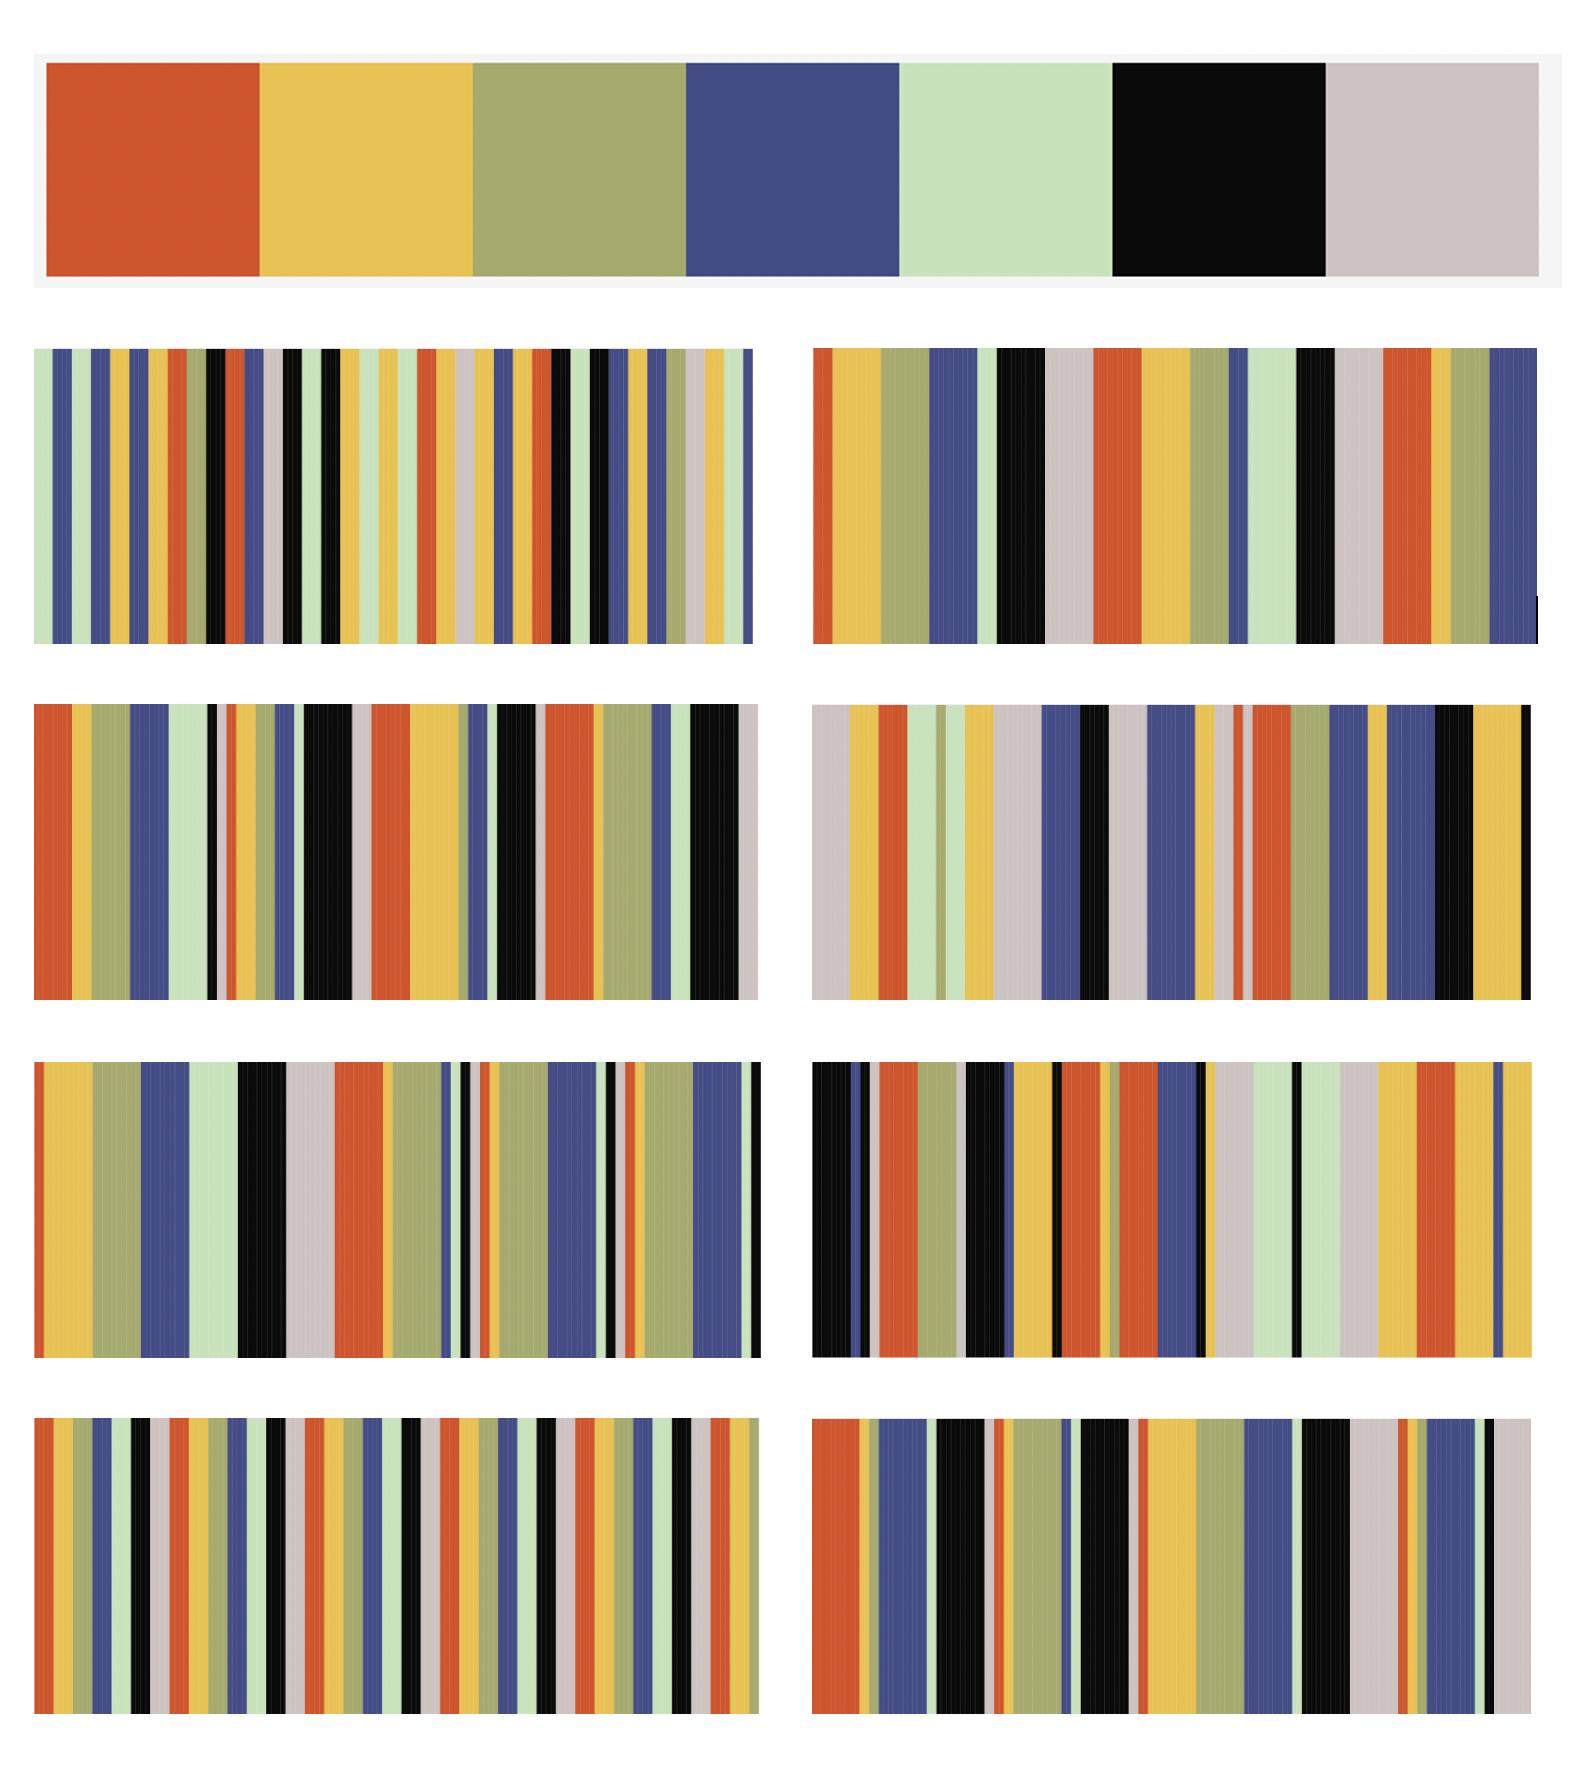 Designing for Checks, Plaids & Striped Fabrics - Red Stone Glen